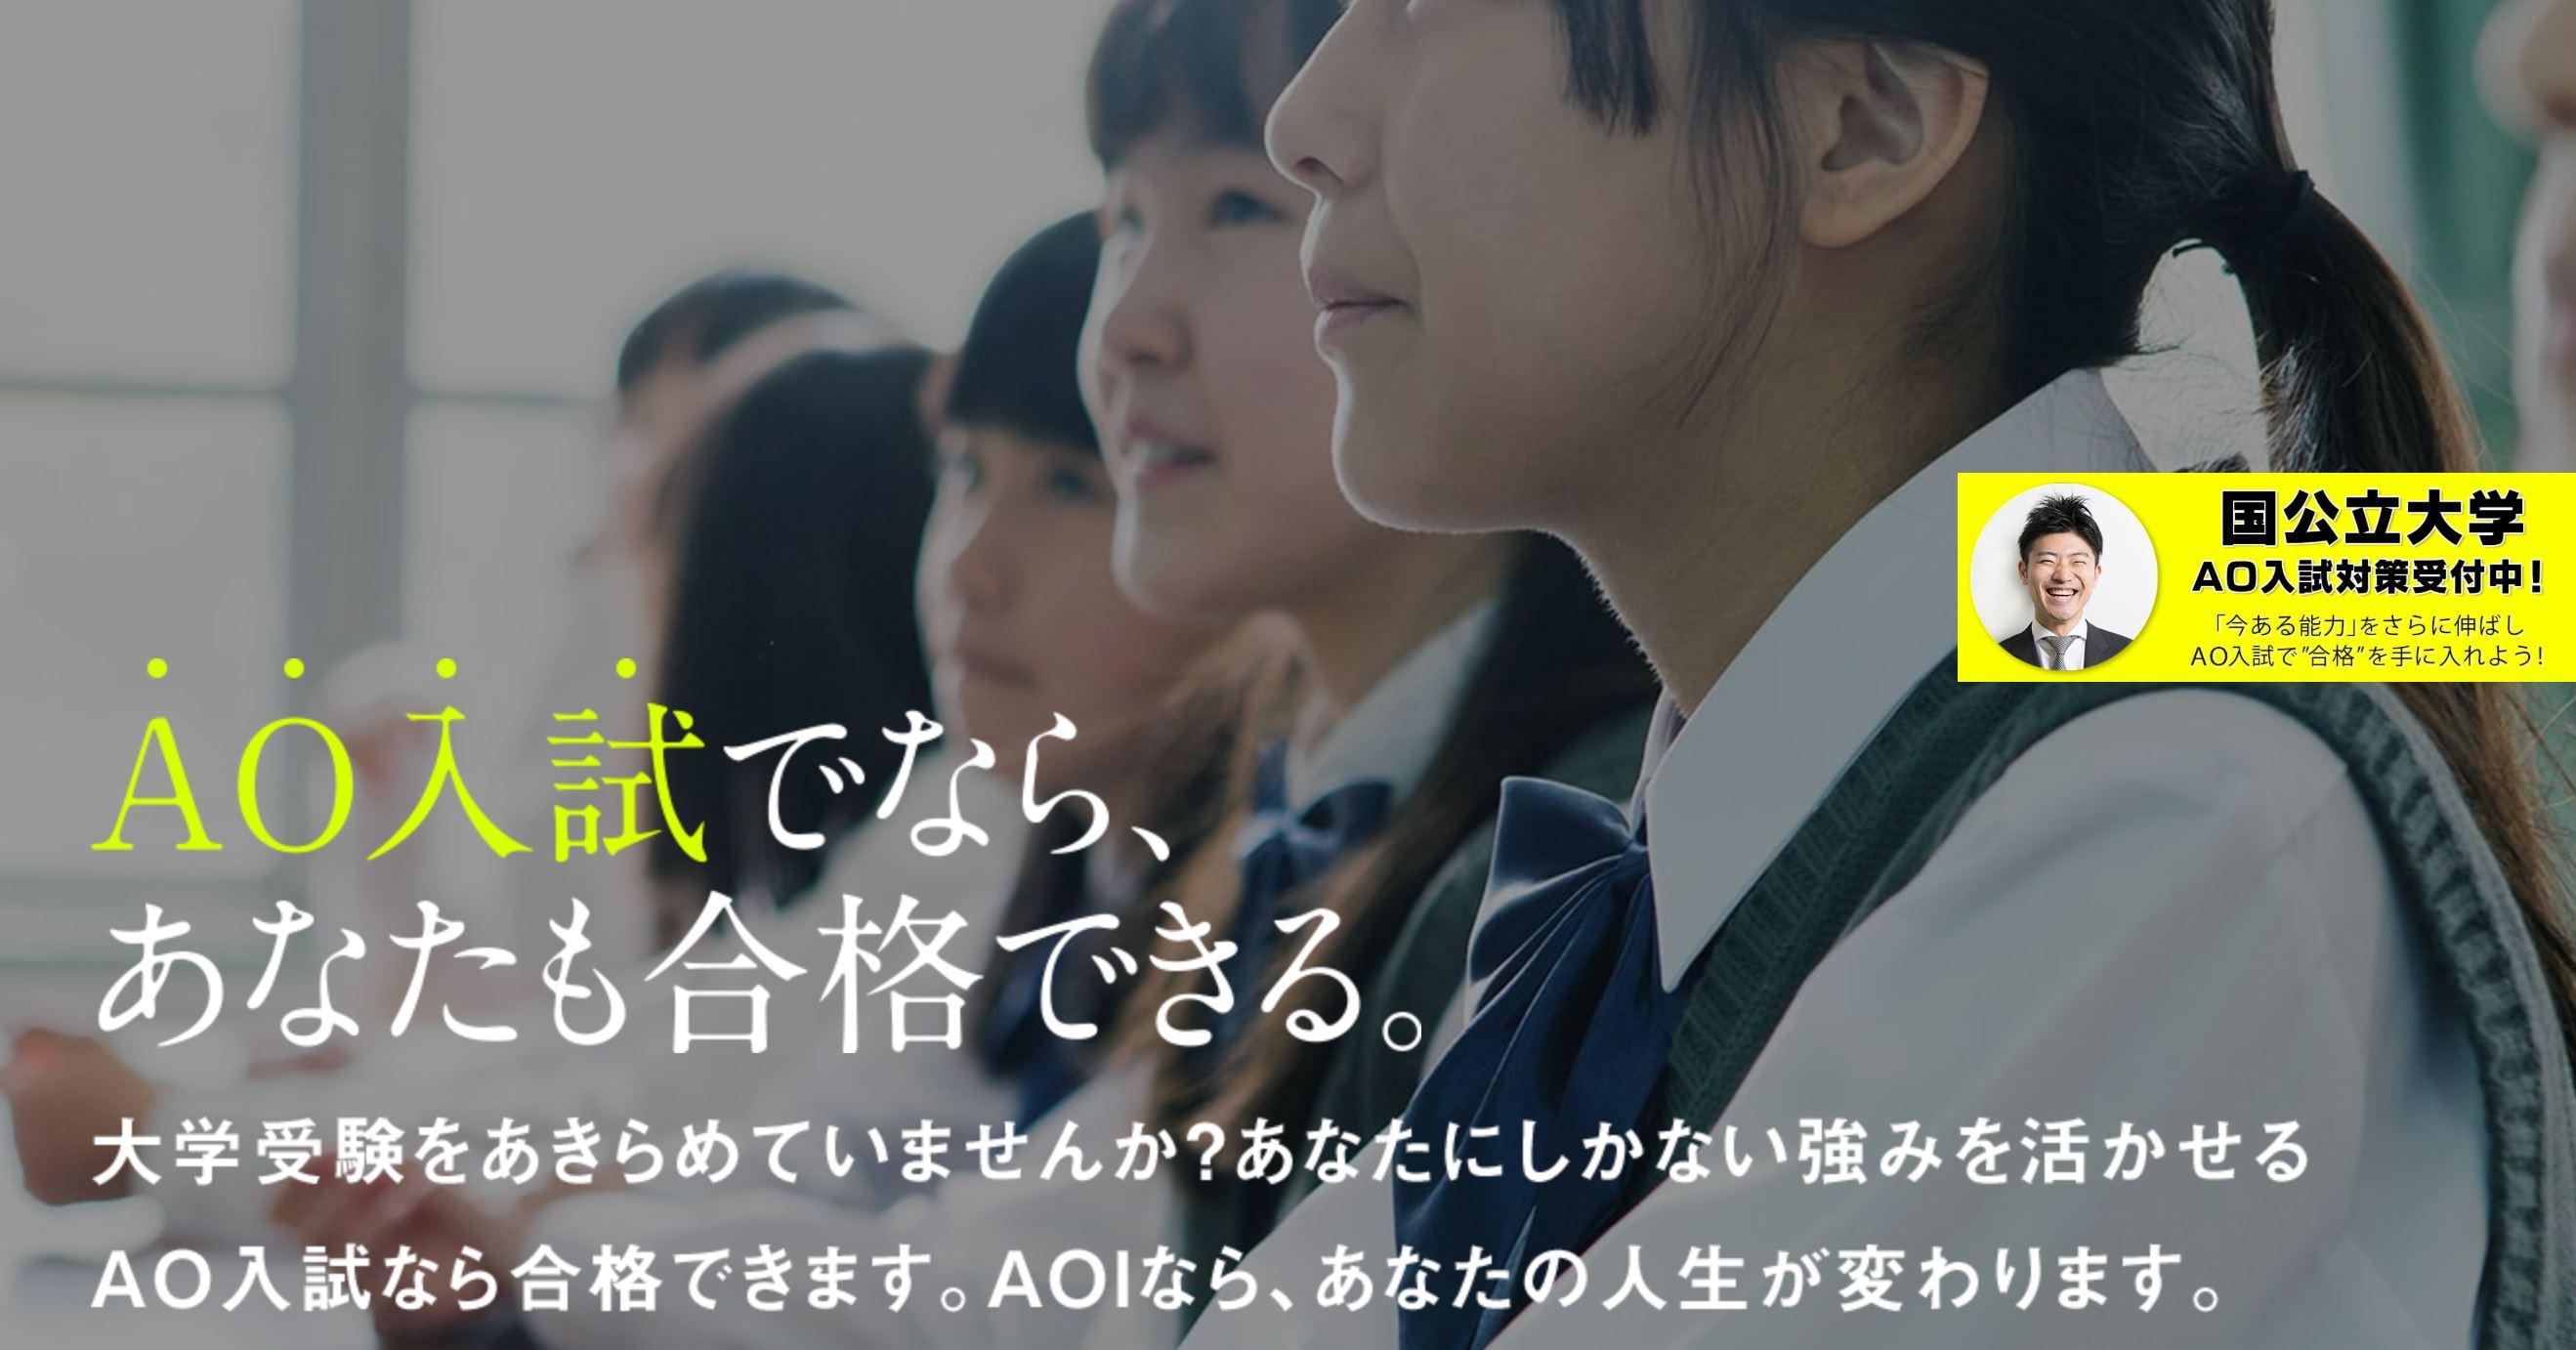 平均合格率驚異の85%!【AO推薦入試専門aoi塾】の評判・料金・口コミ